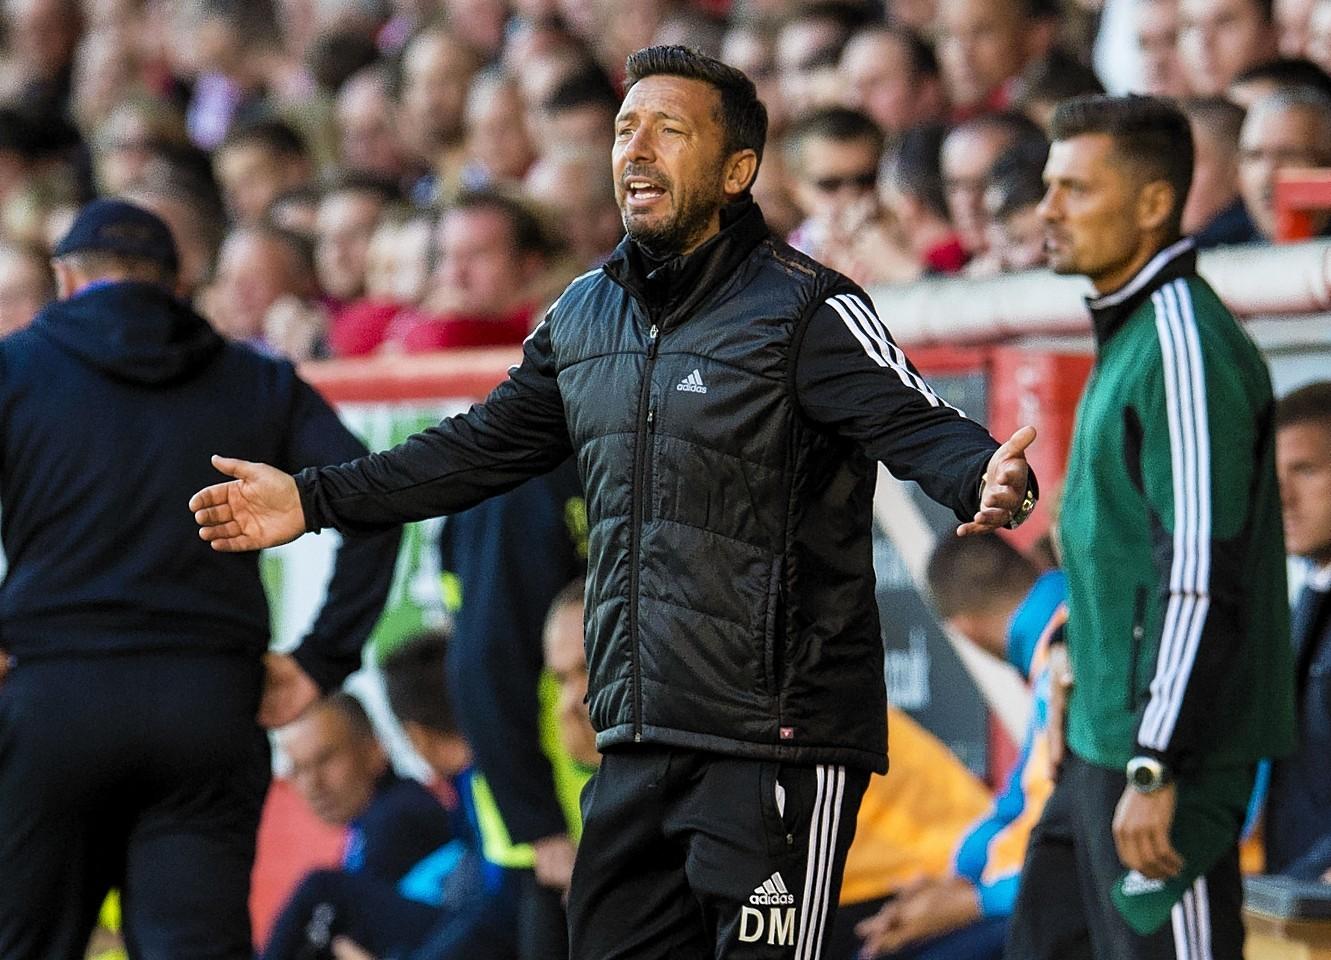 Derek McInnes encourages his players